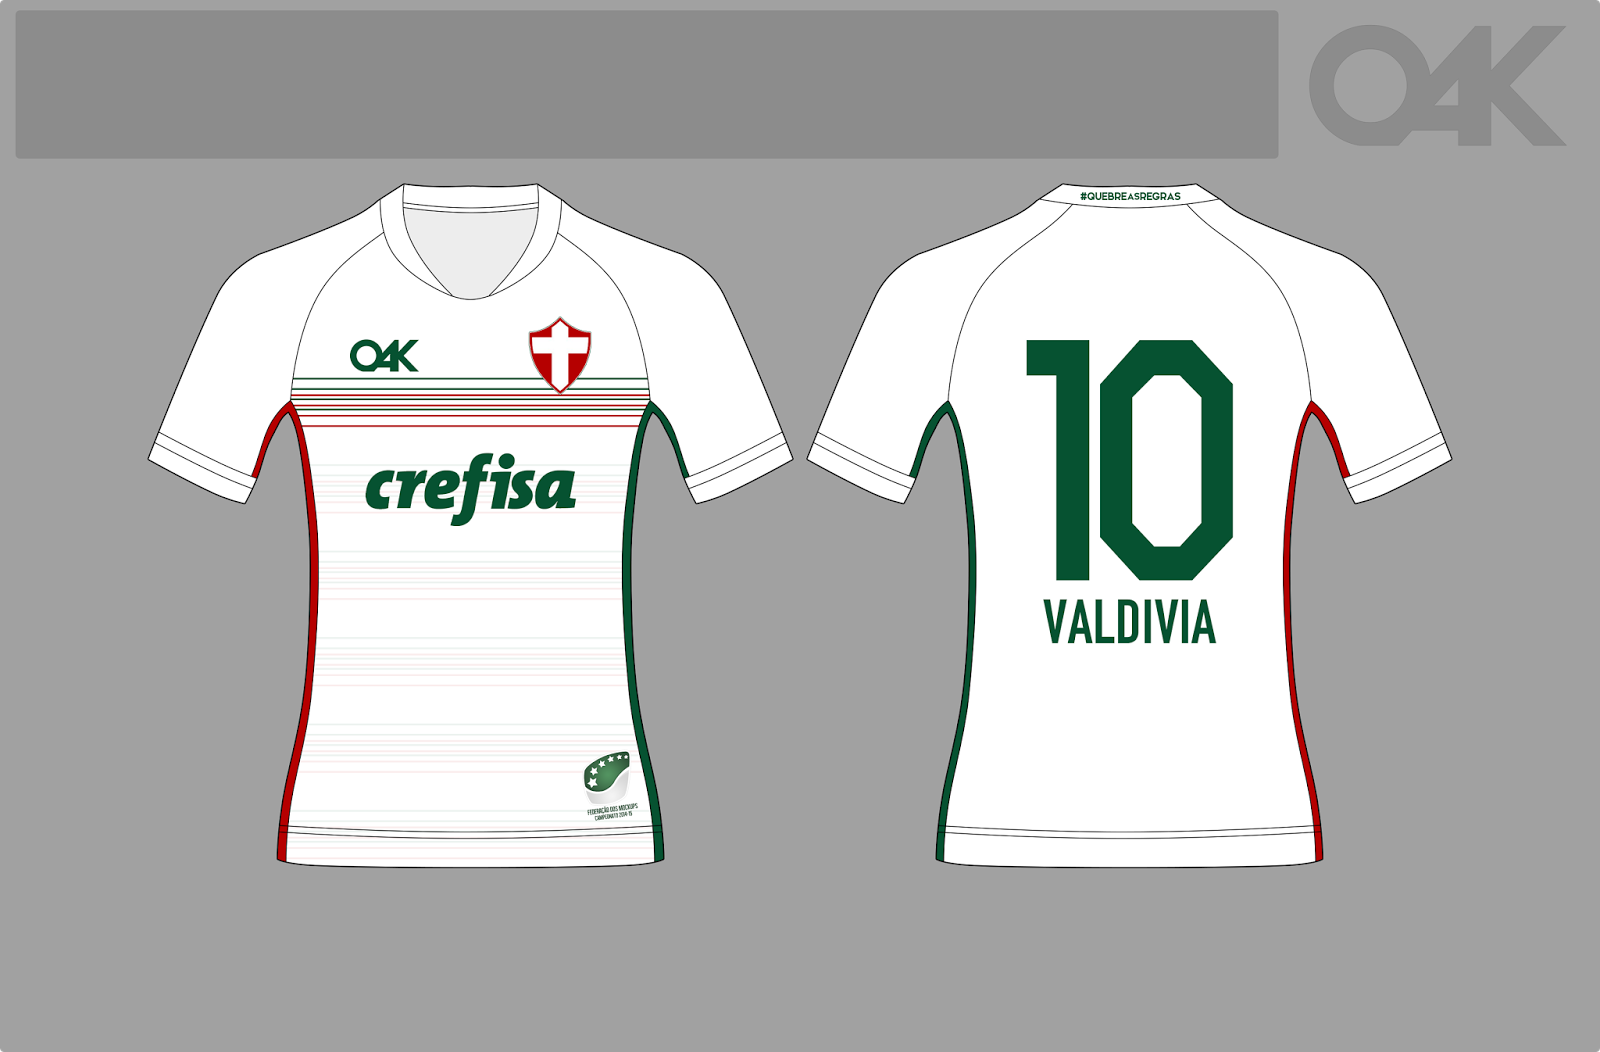 3e2cb1c16f Campeonato de Mockups Camisetas de Futebol  68º Campeonato de ...